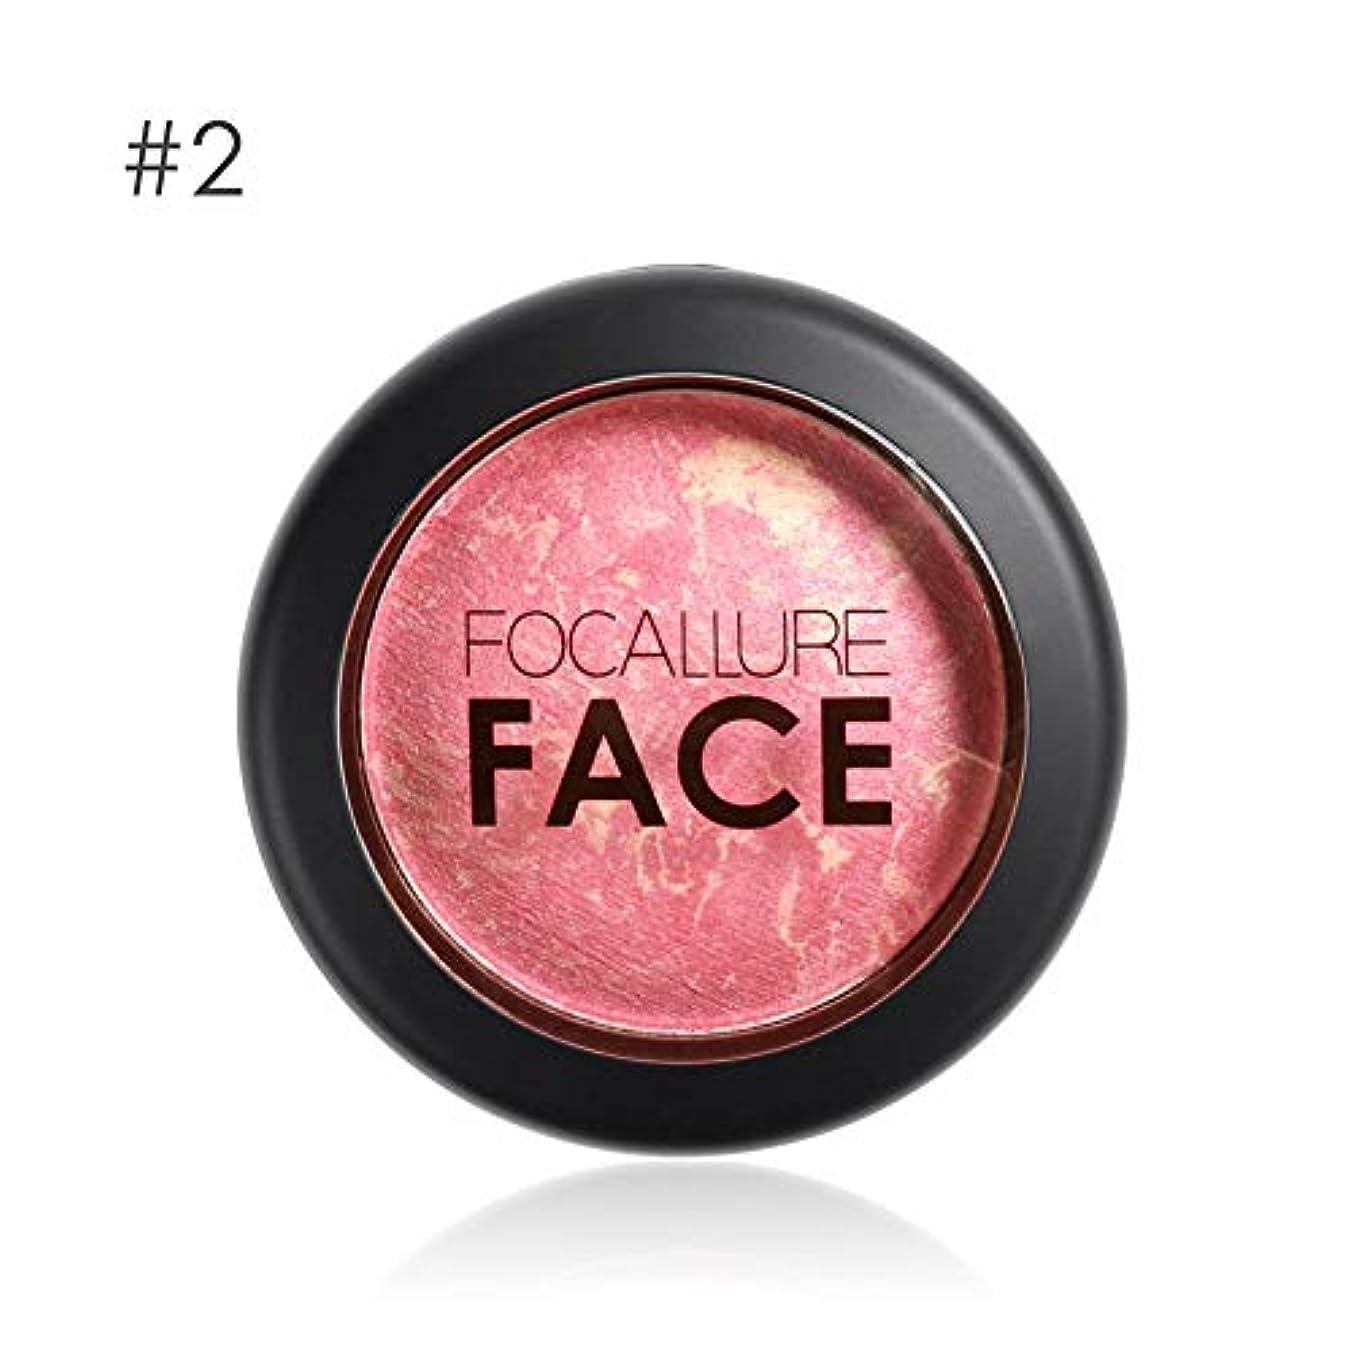 Focallure 6色プロフェッショナル頬焼き赤面フェイス輪郭頬紅メイク - 2#